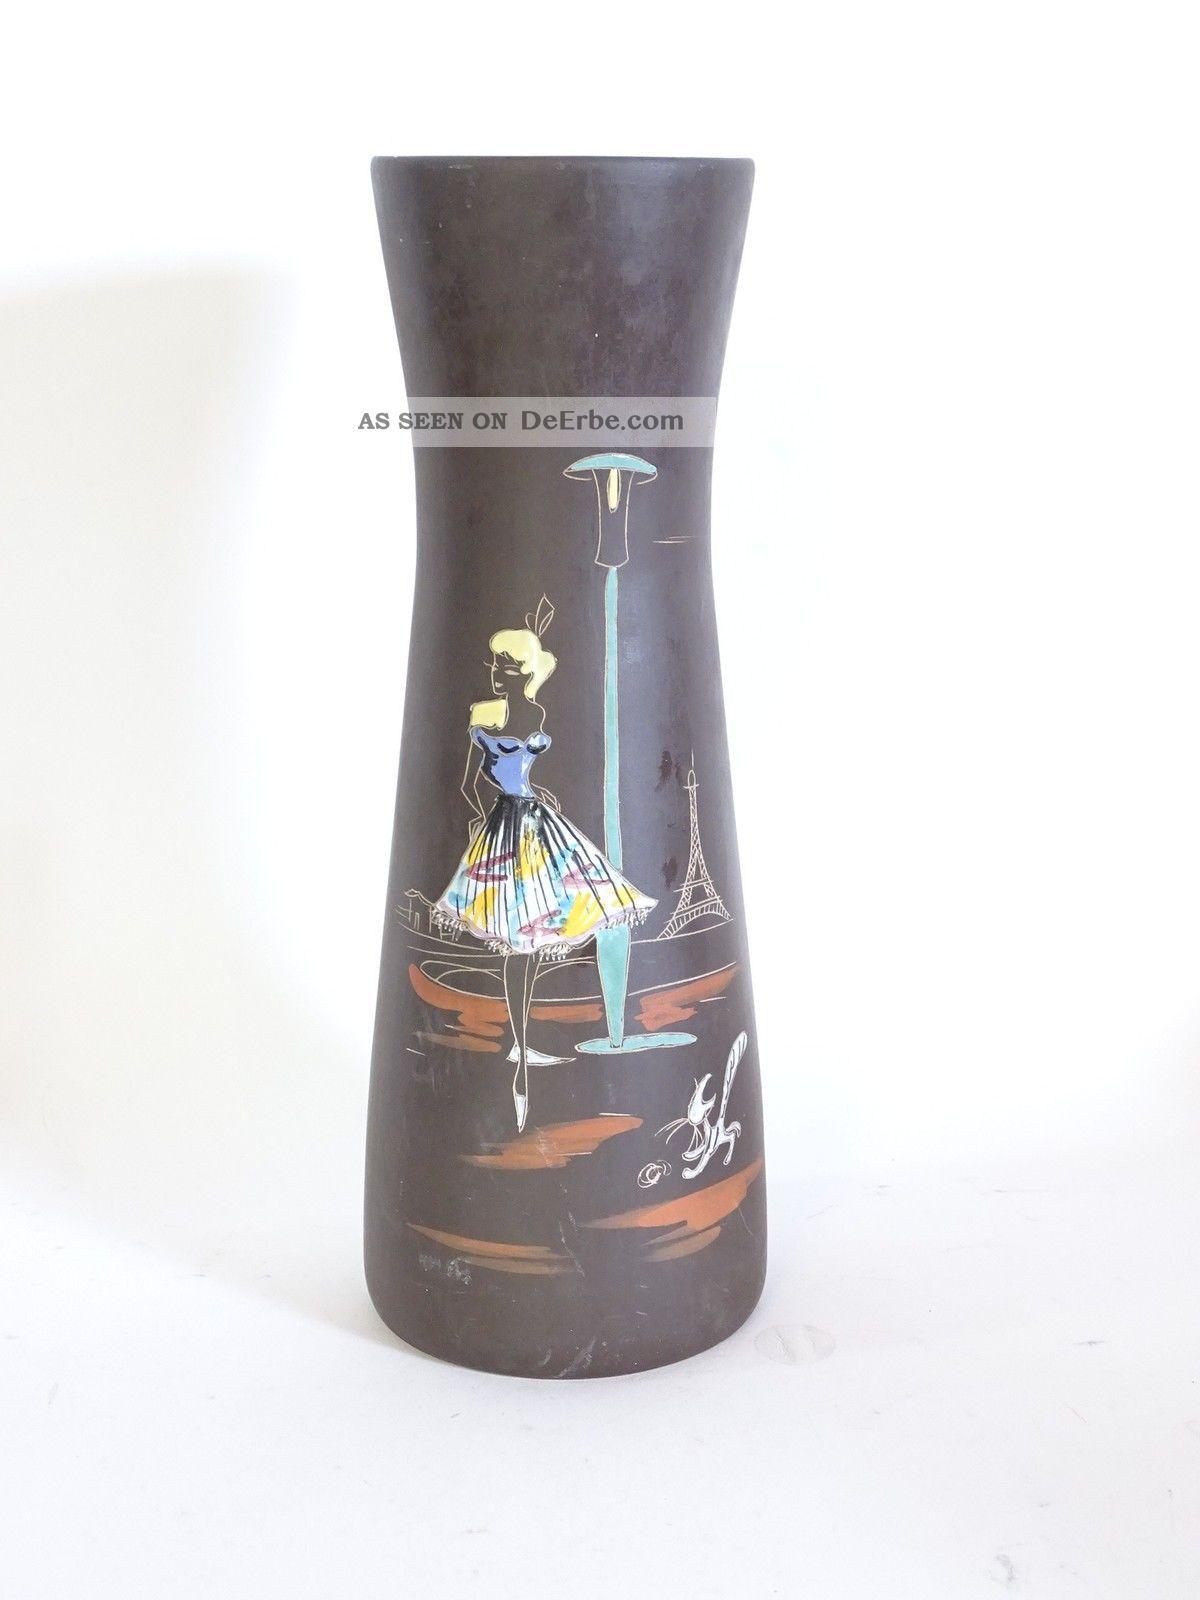 Mid Century 50er Jahre Keramik Vase Paris Tanzendes Mädchen Katze Eifelturm 1950-1959 Bild